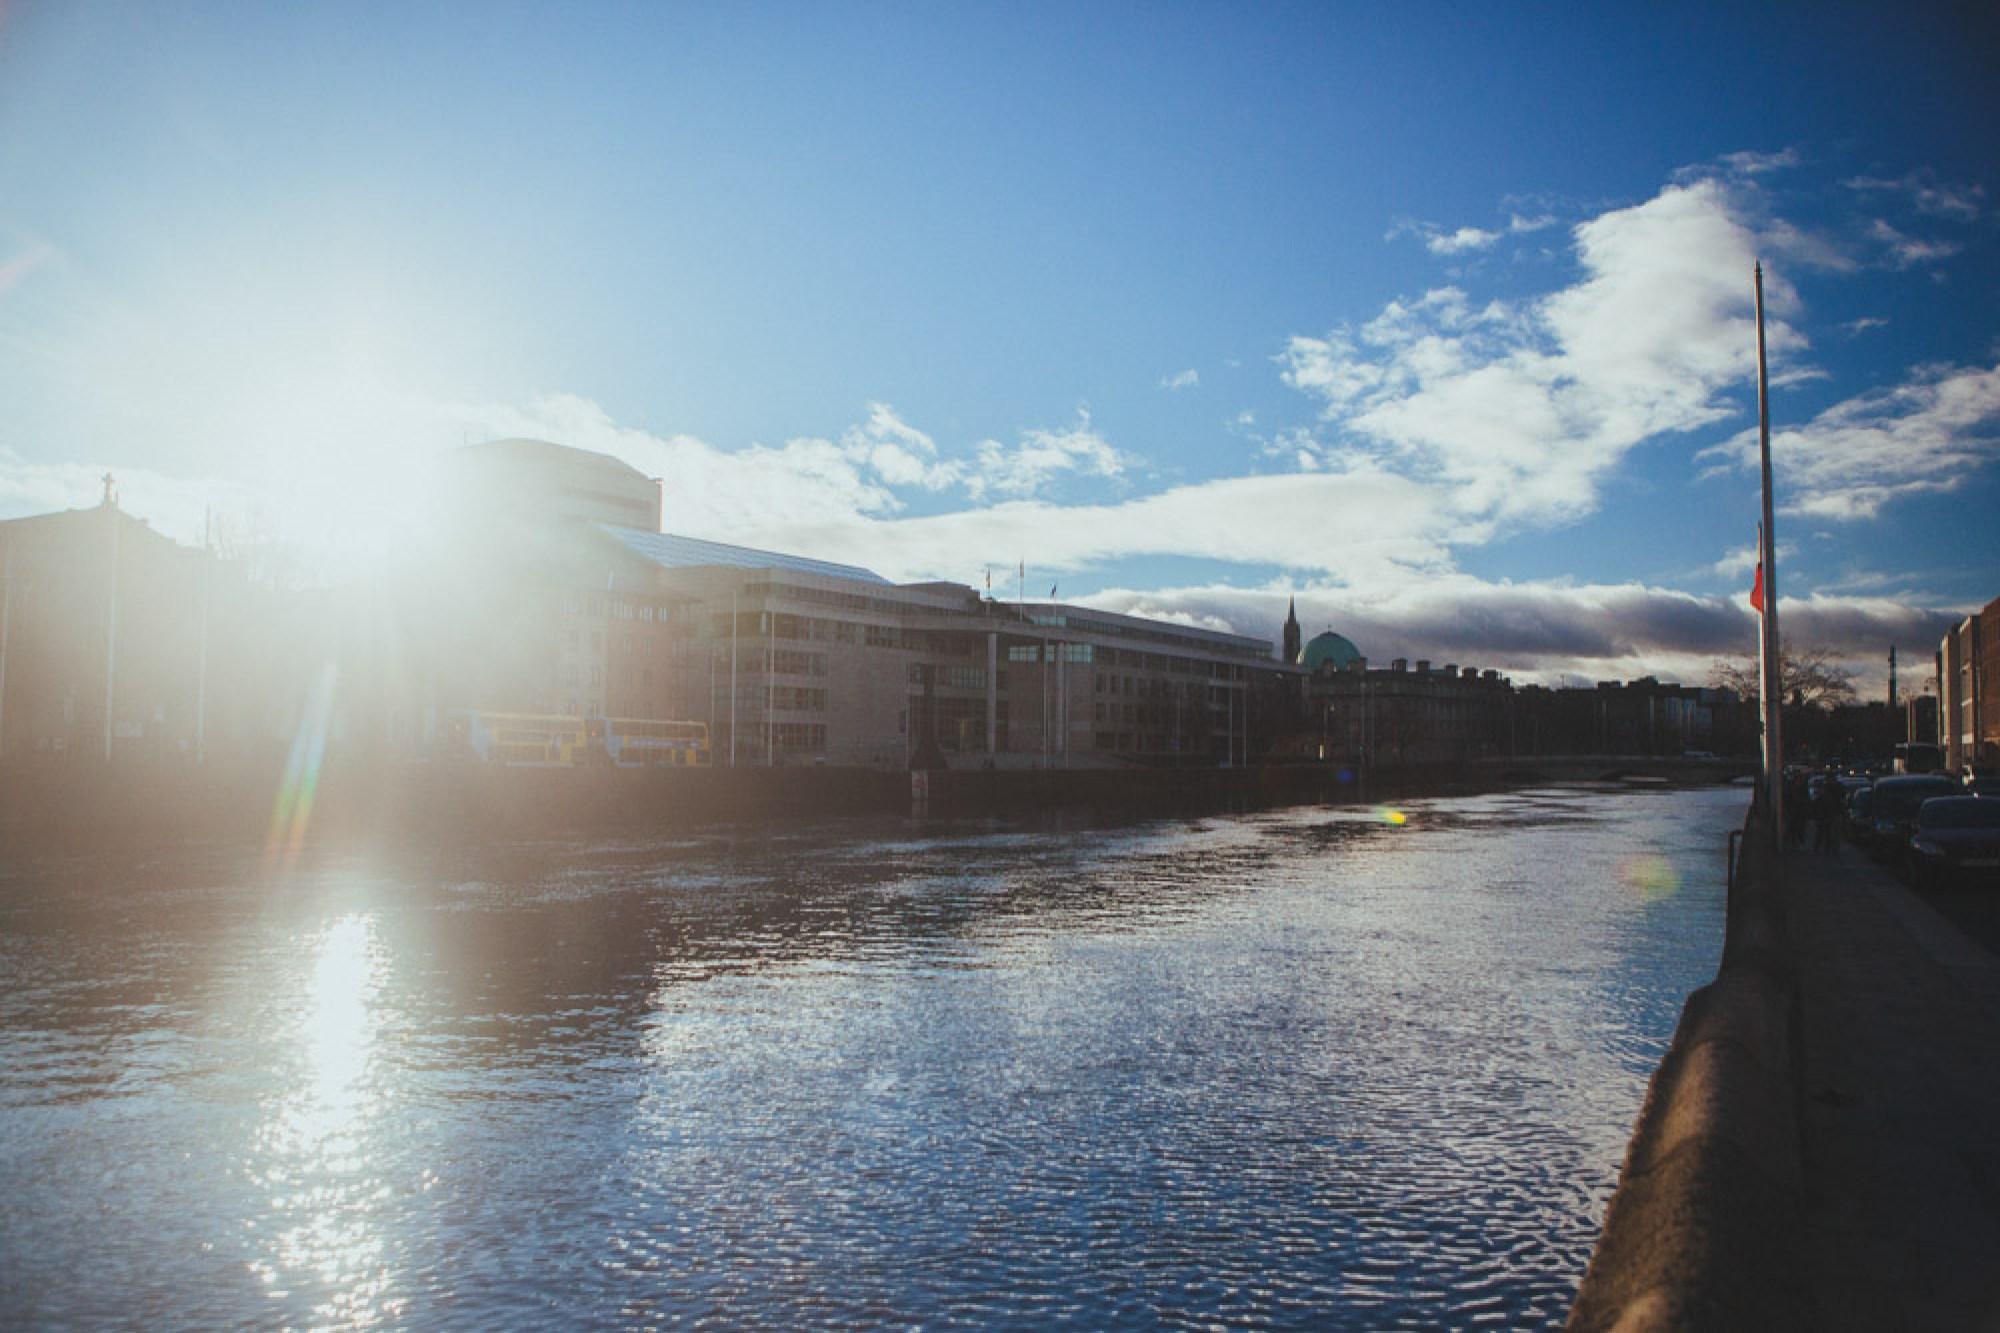 48 Hours in Dublin Travel Guide